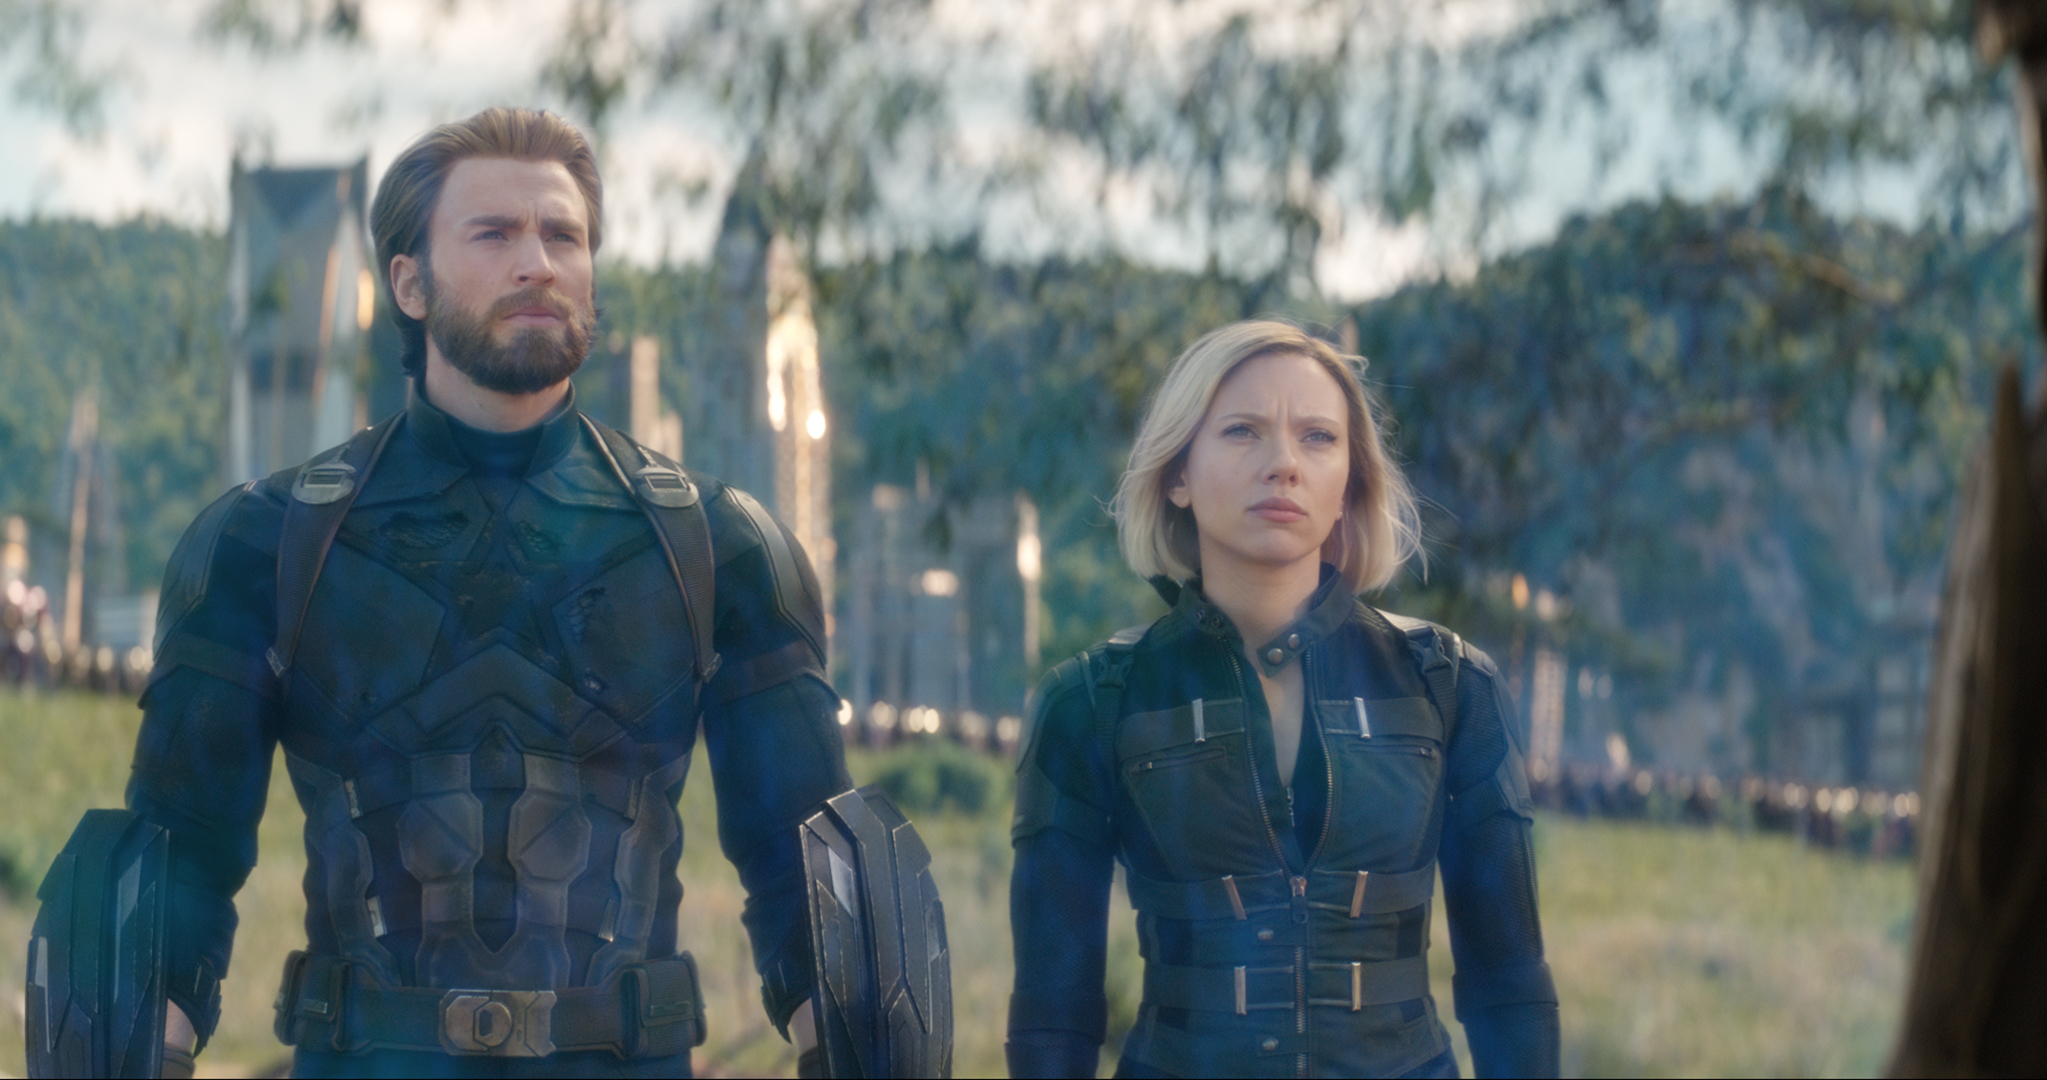 Captain America/Steve Rogers (Chris Evans) and Black Widow/Natasha Romanoff (Scarlett Johansson) in Avengres: Infinity War